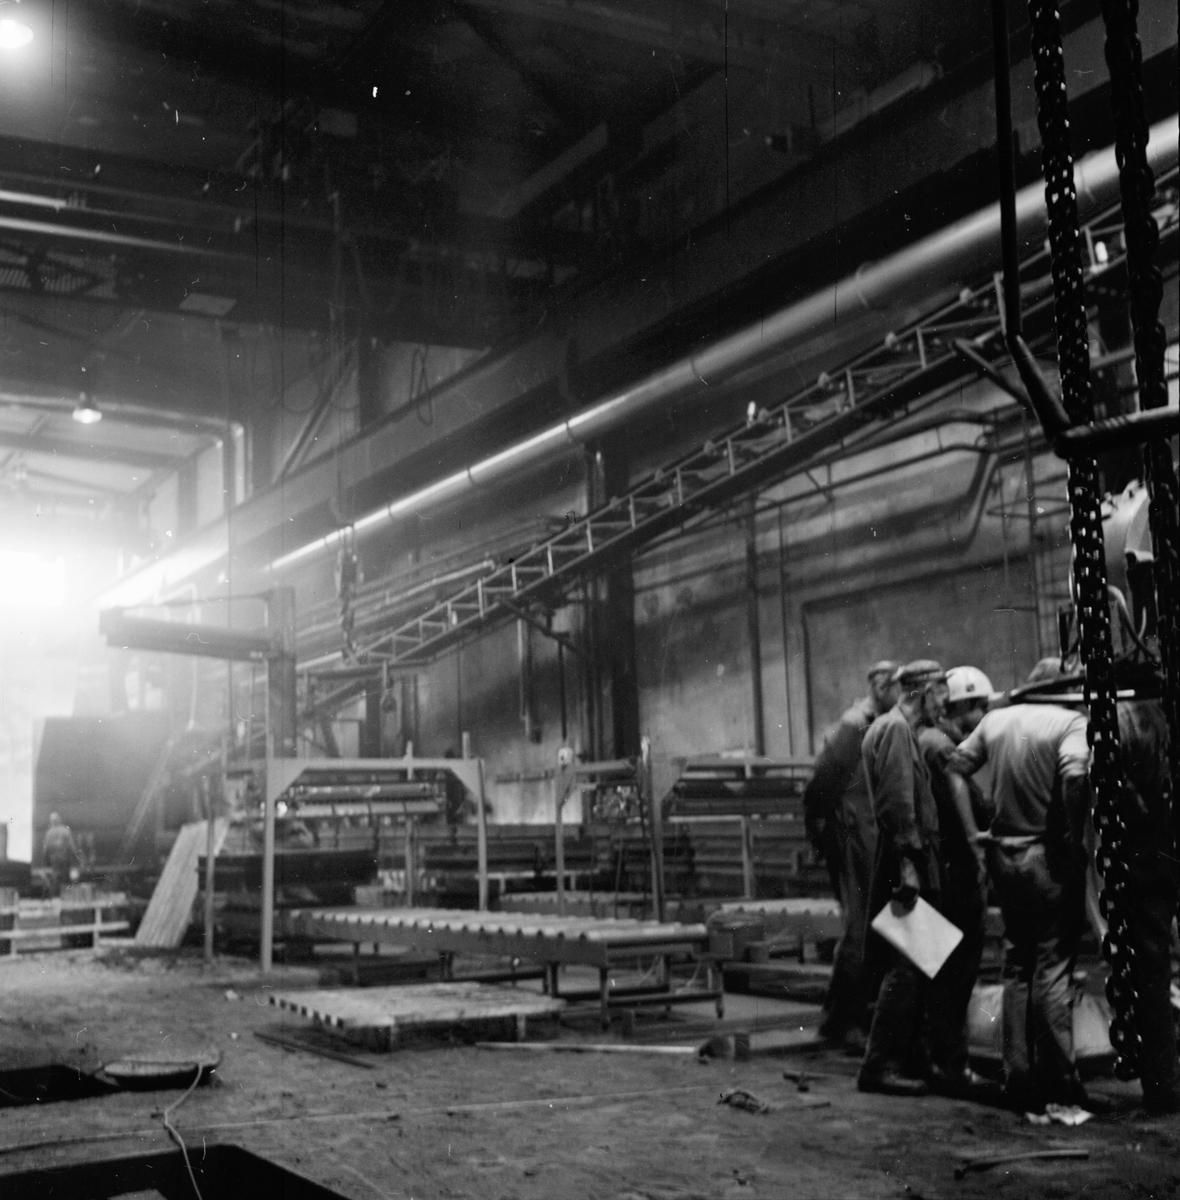 Arbrå, Verkstadens nya gjuteri, Aug 1970